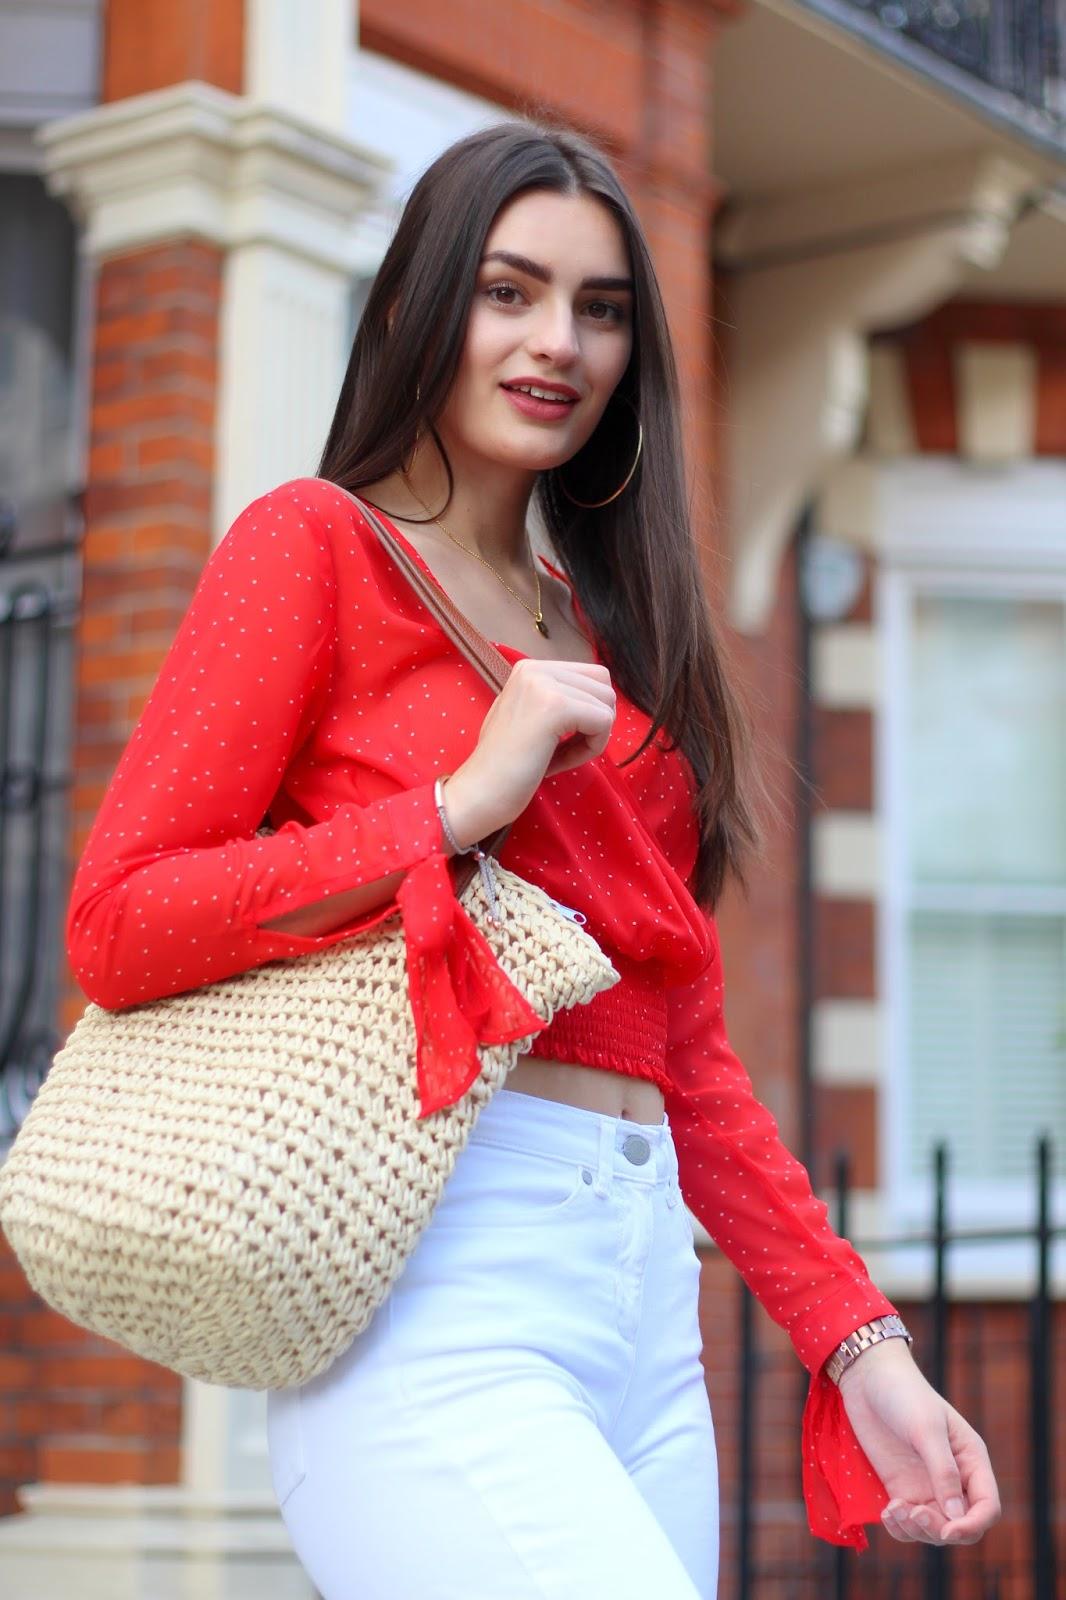 peexo straw bag m&s summer accessories